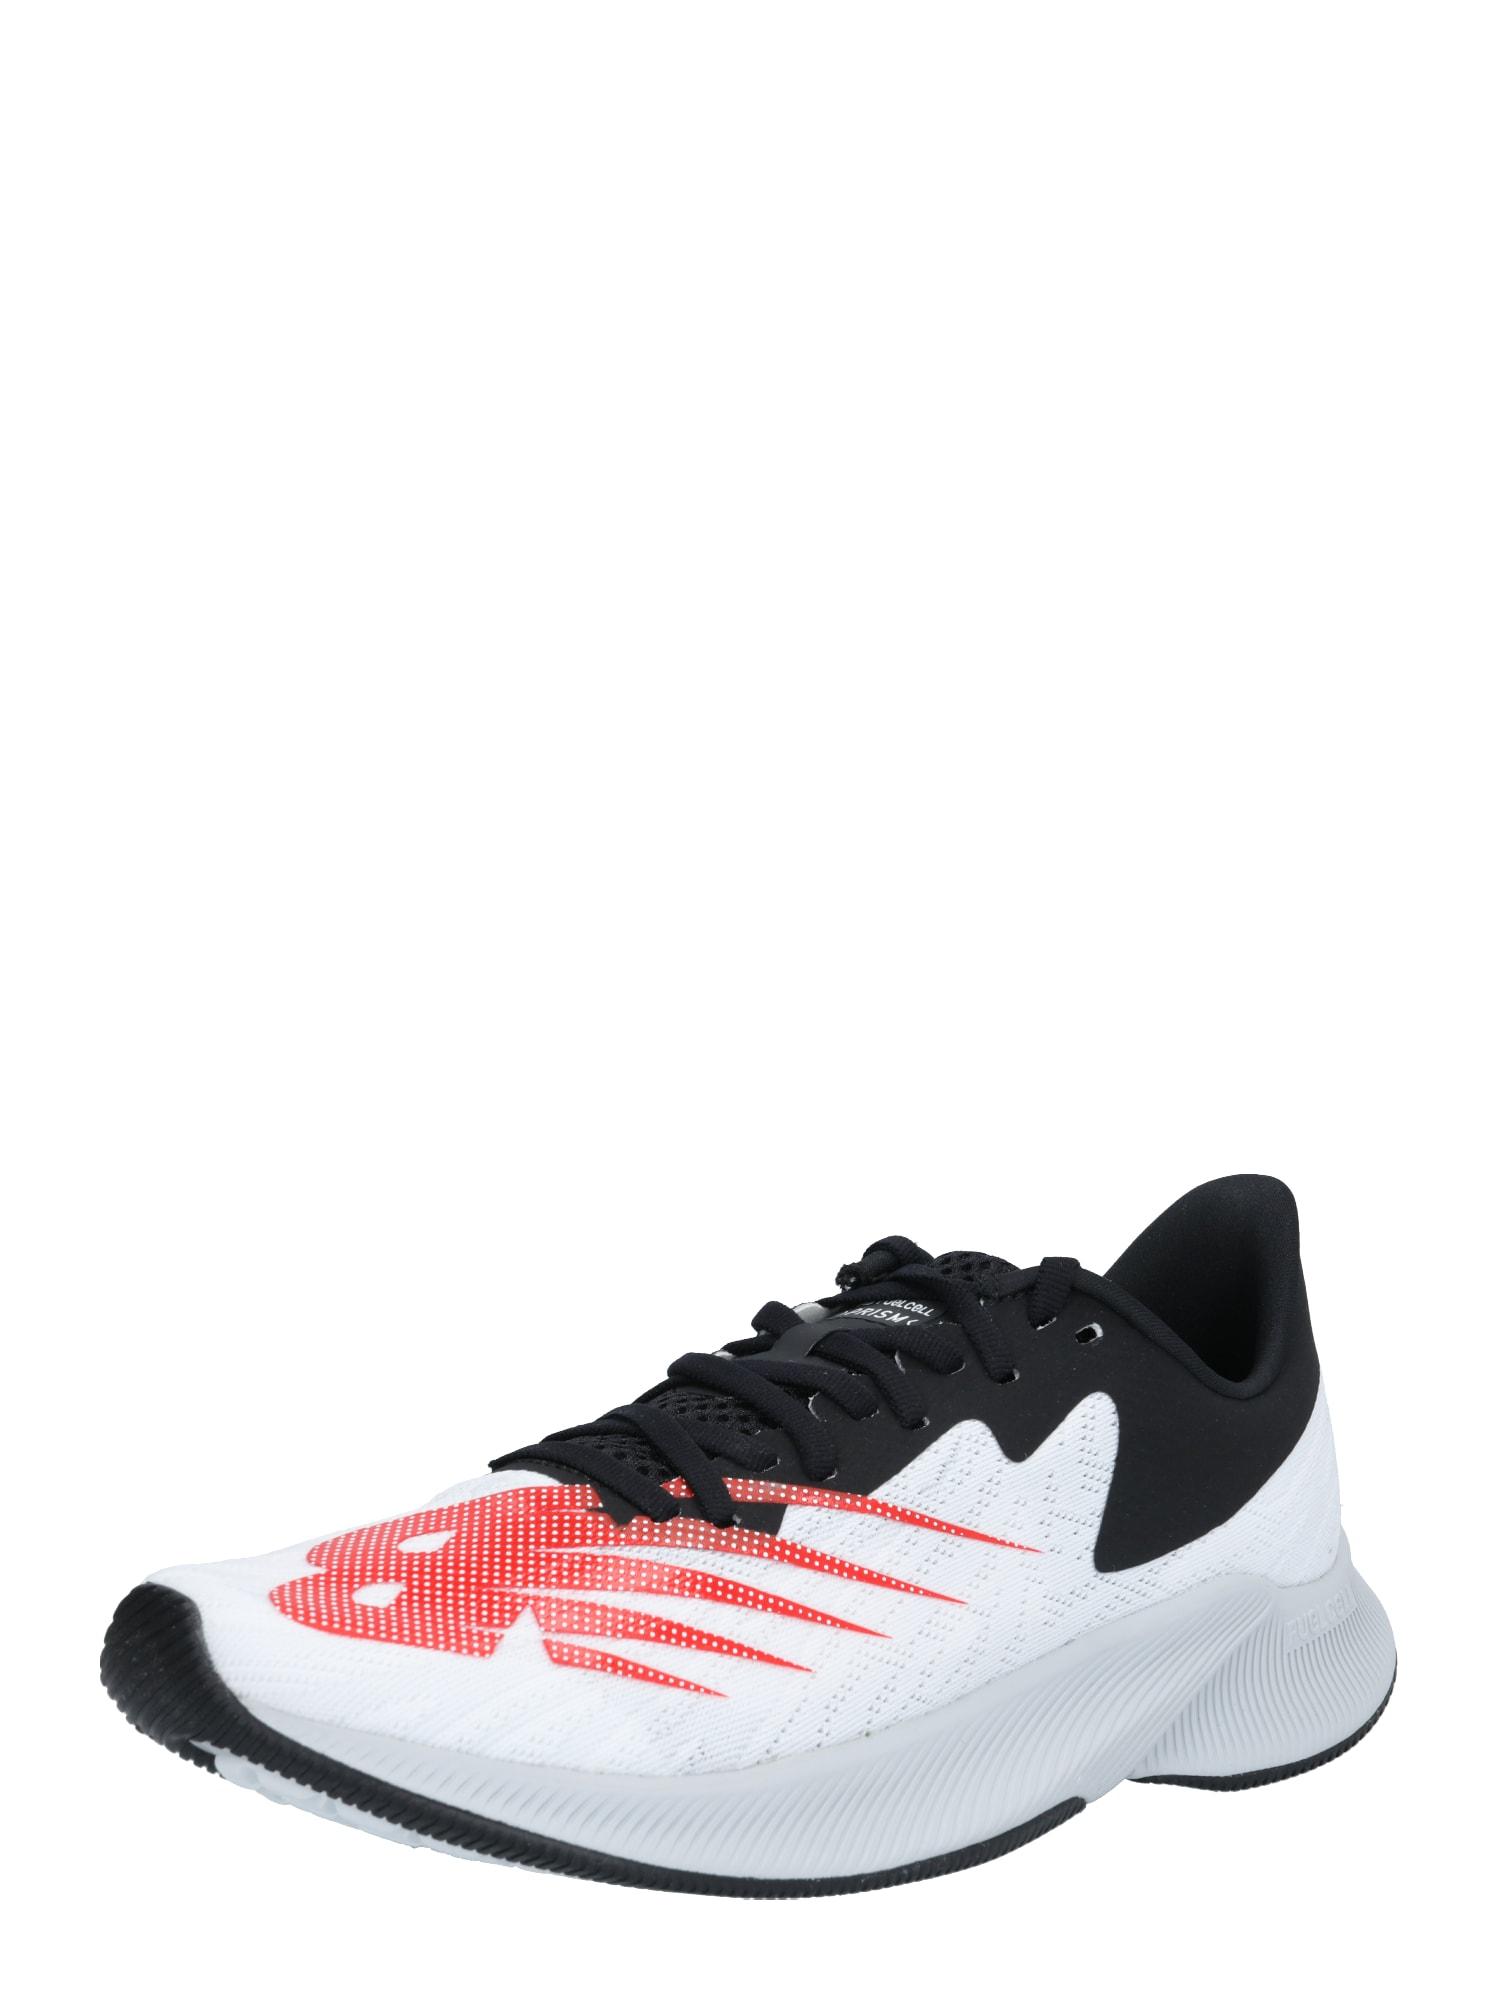 new balance Bėgimo batai juoda / raudona / balta